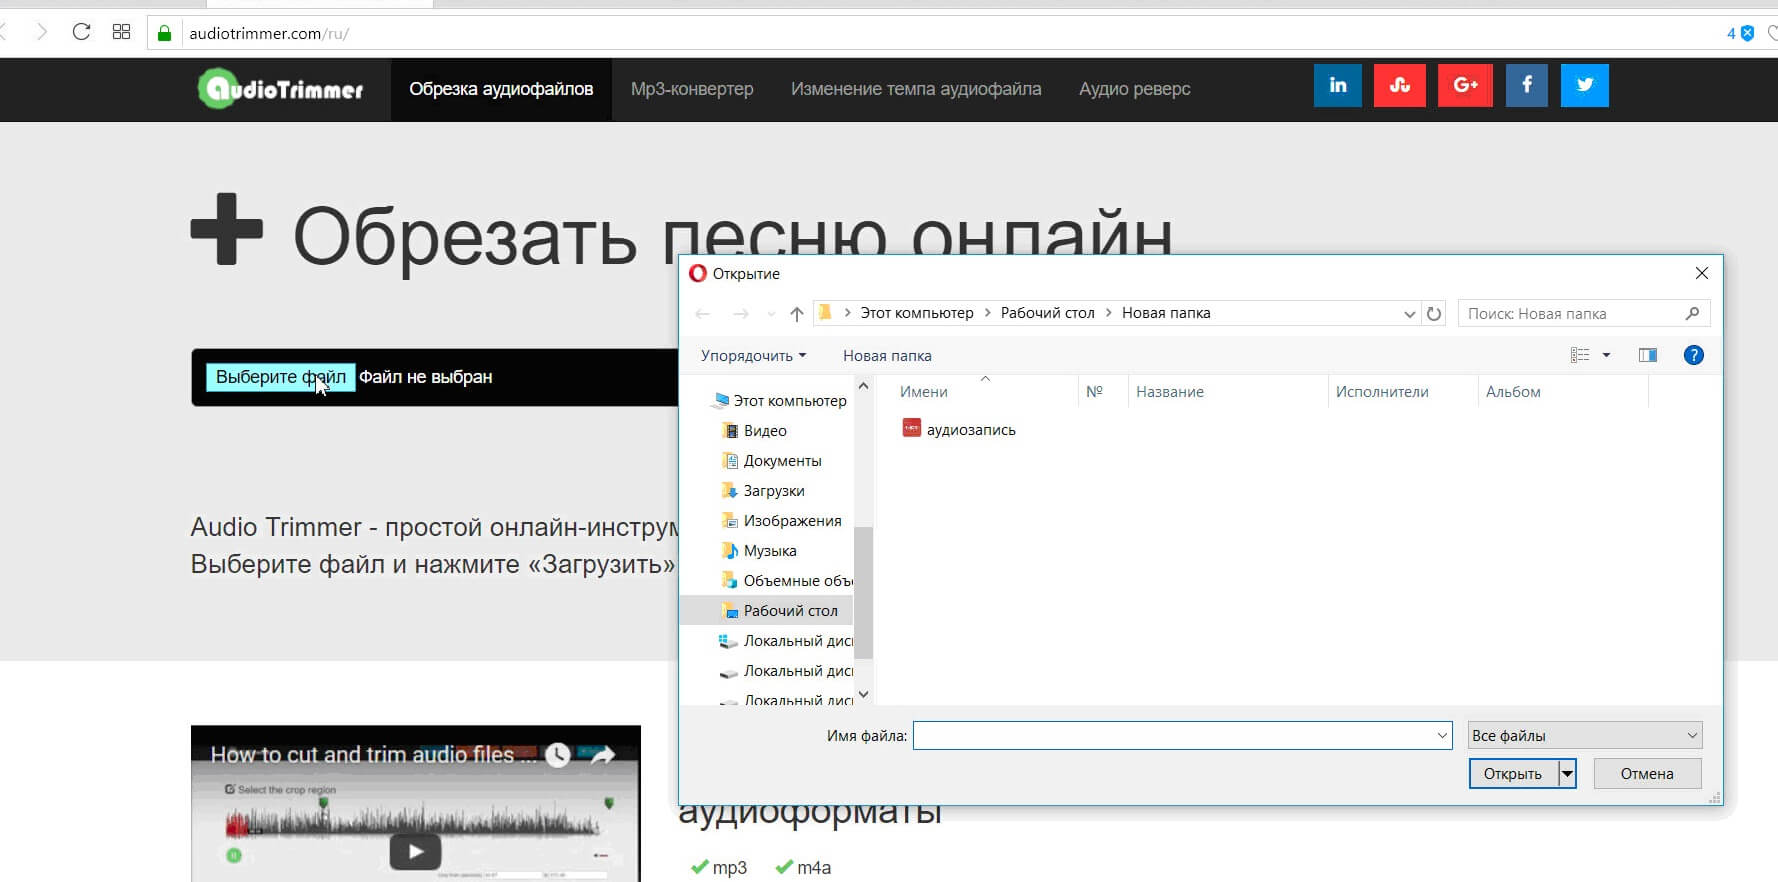 онлайн редактор audiotrimmer.com